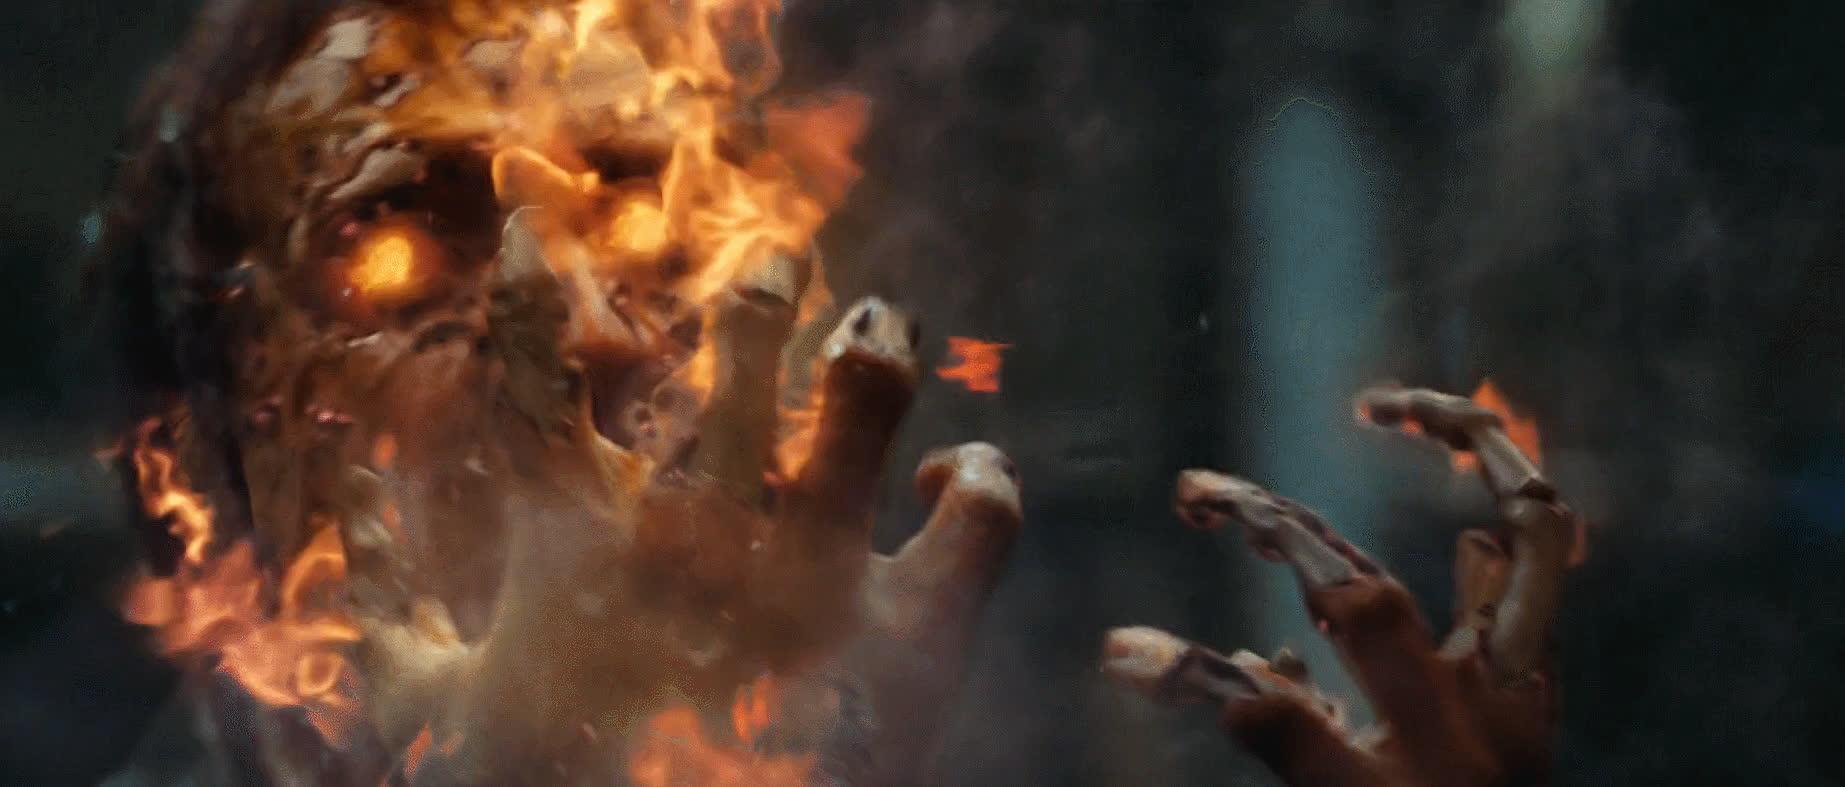 onetruegod, Ghost Rider Transformation GIFs